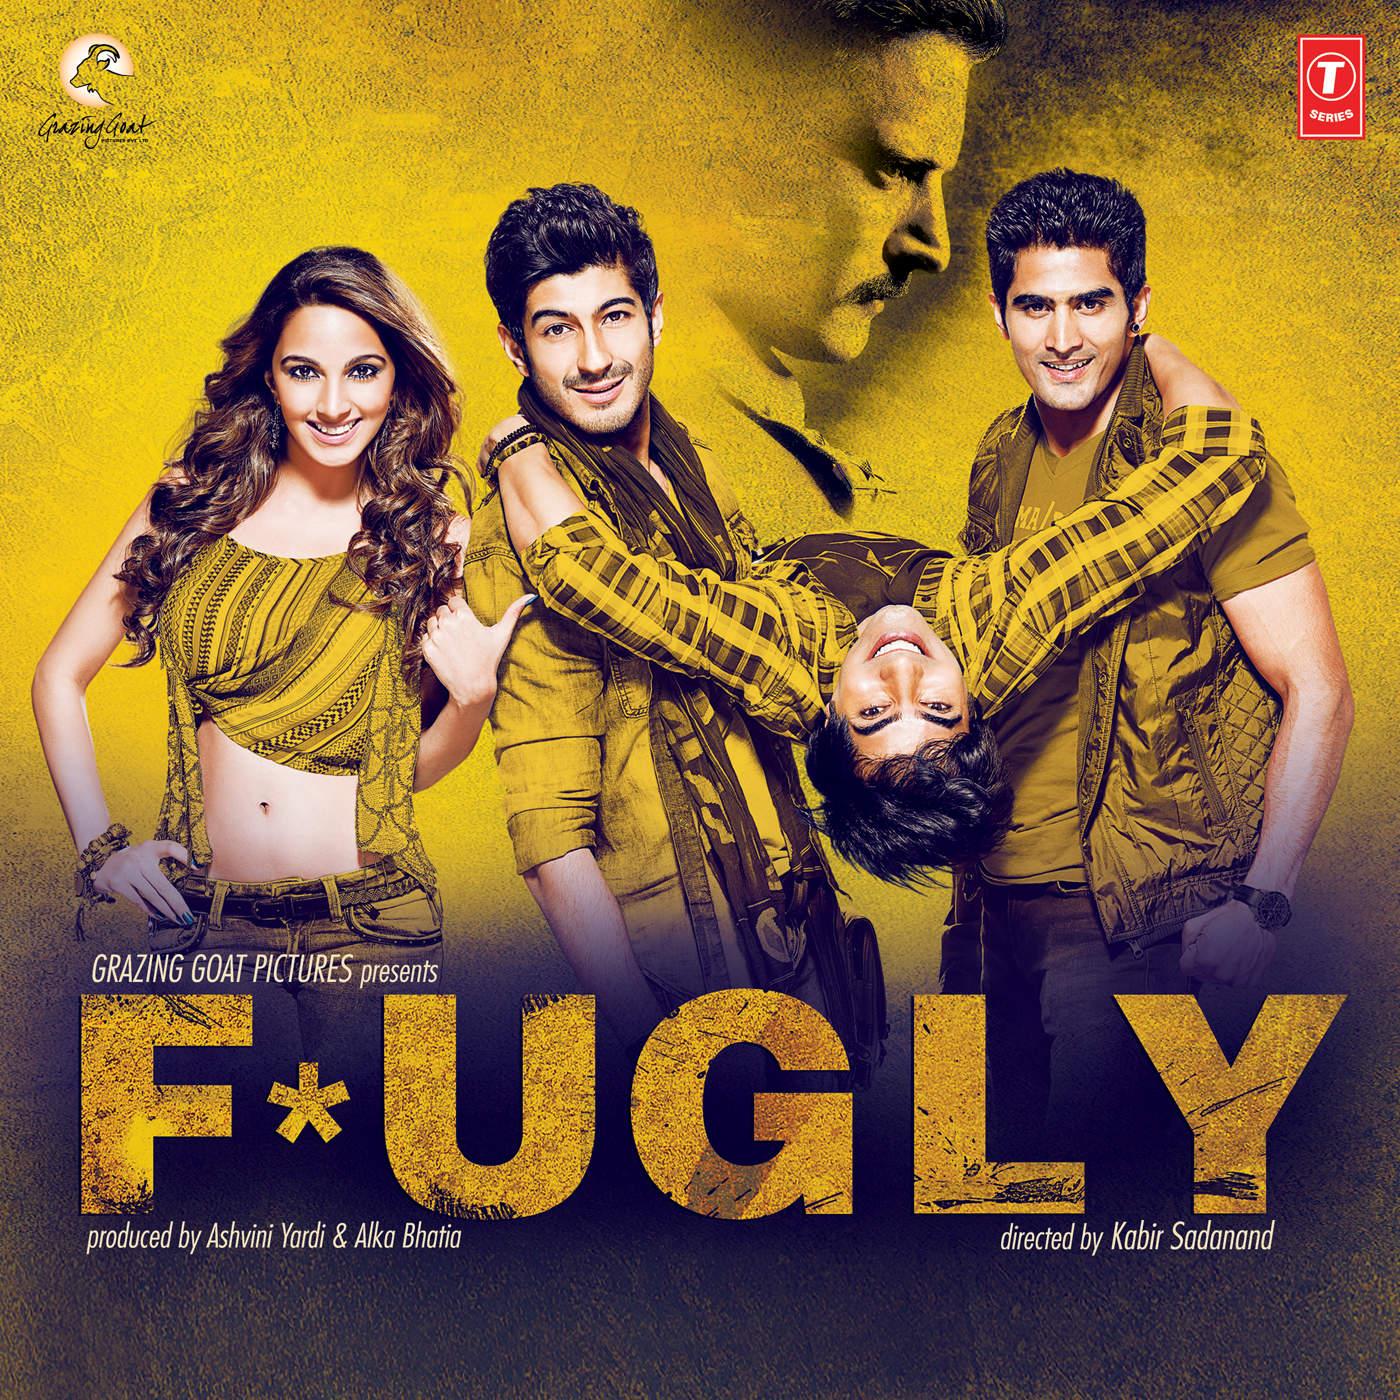 Prashant Vadhyar, Yo Yo Honey Singh & Raftaar - Fugly (Original Motion Picture Soundtrack)